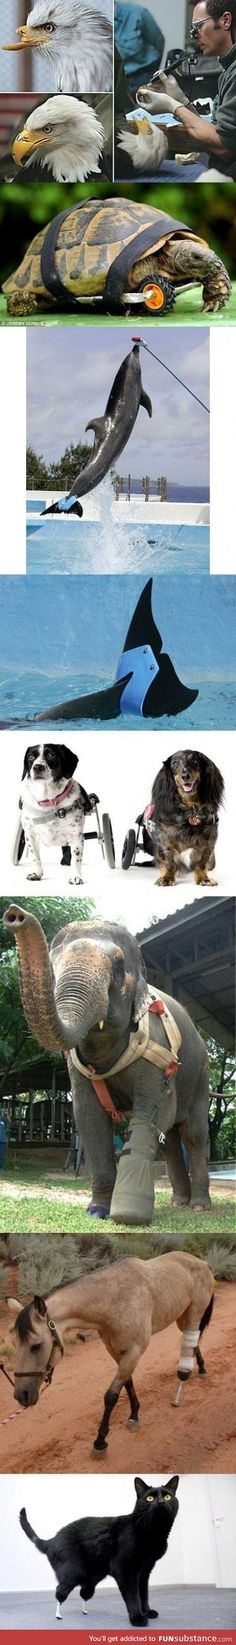 Cool animal prosthetics.